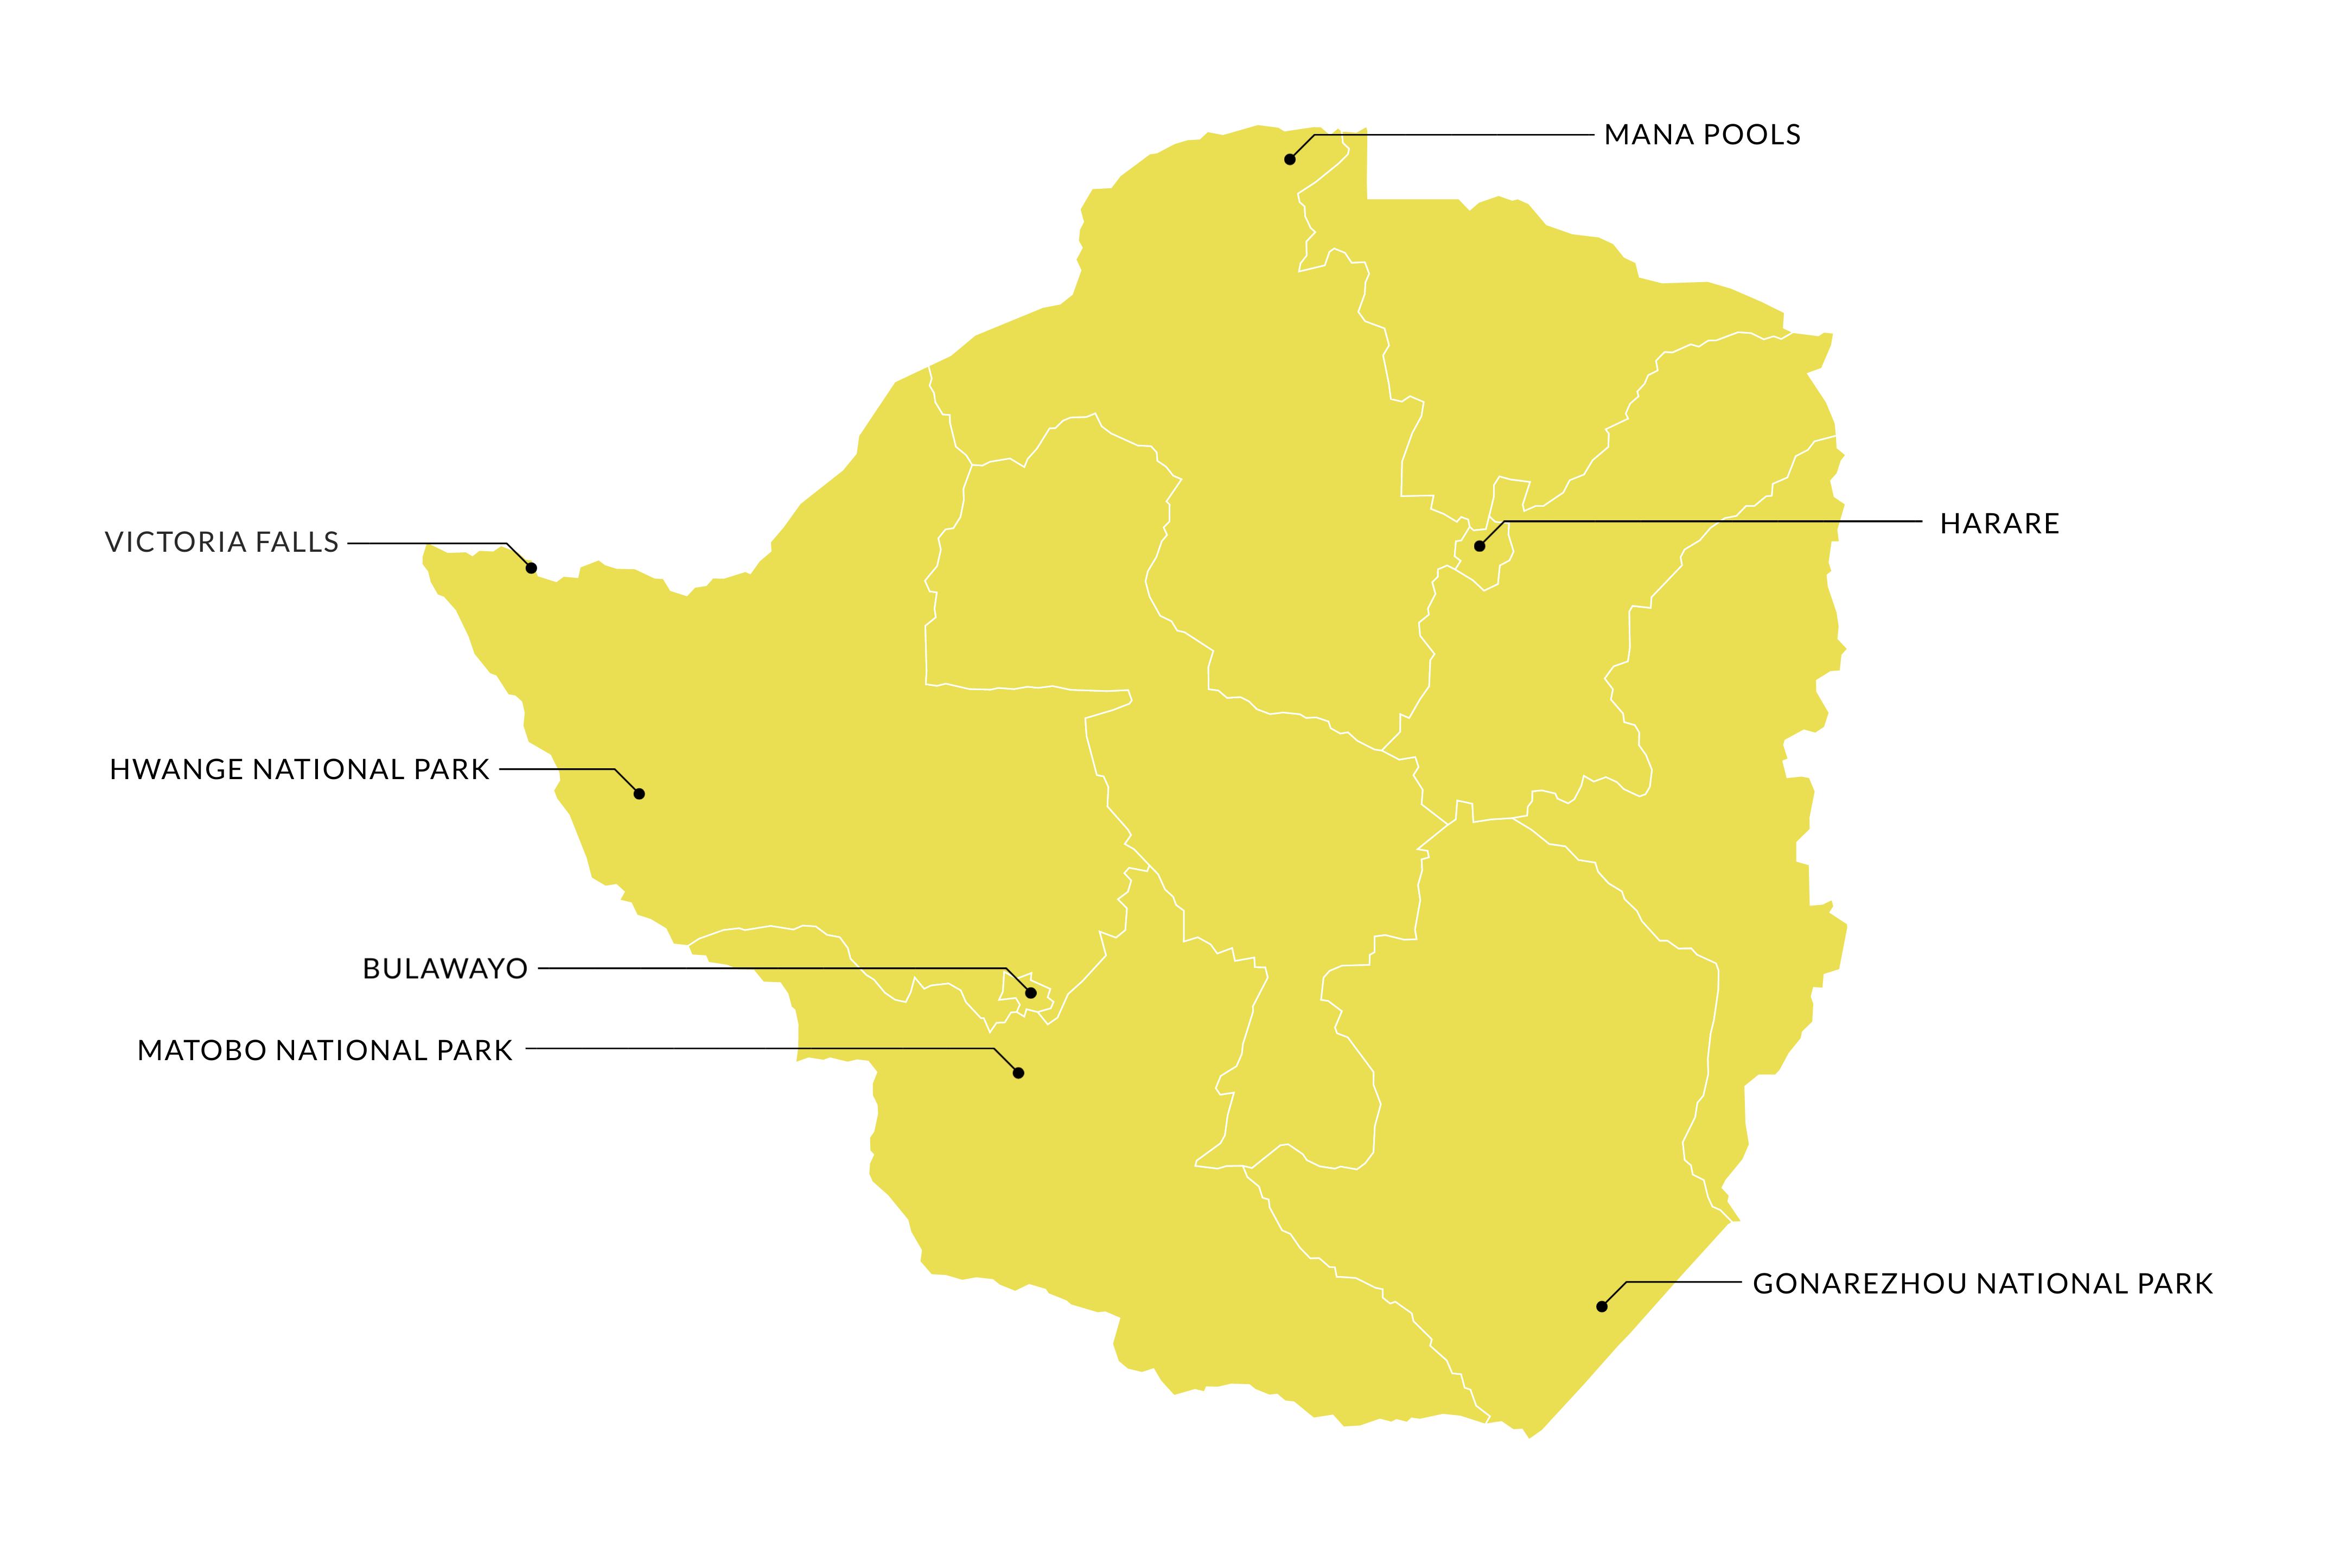 zimbabwe-map